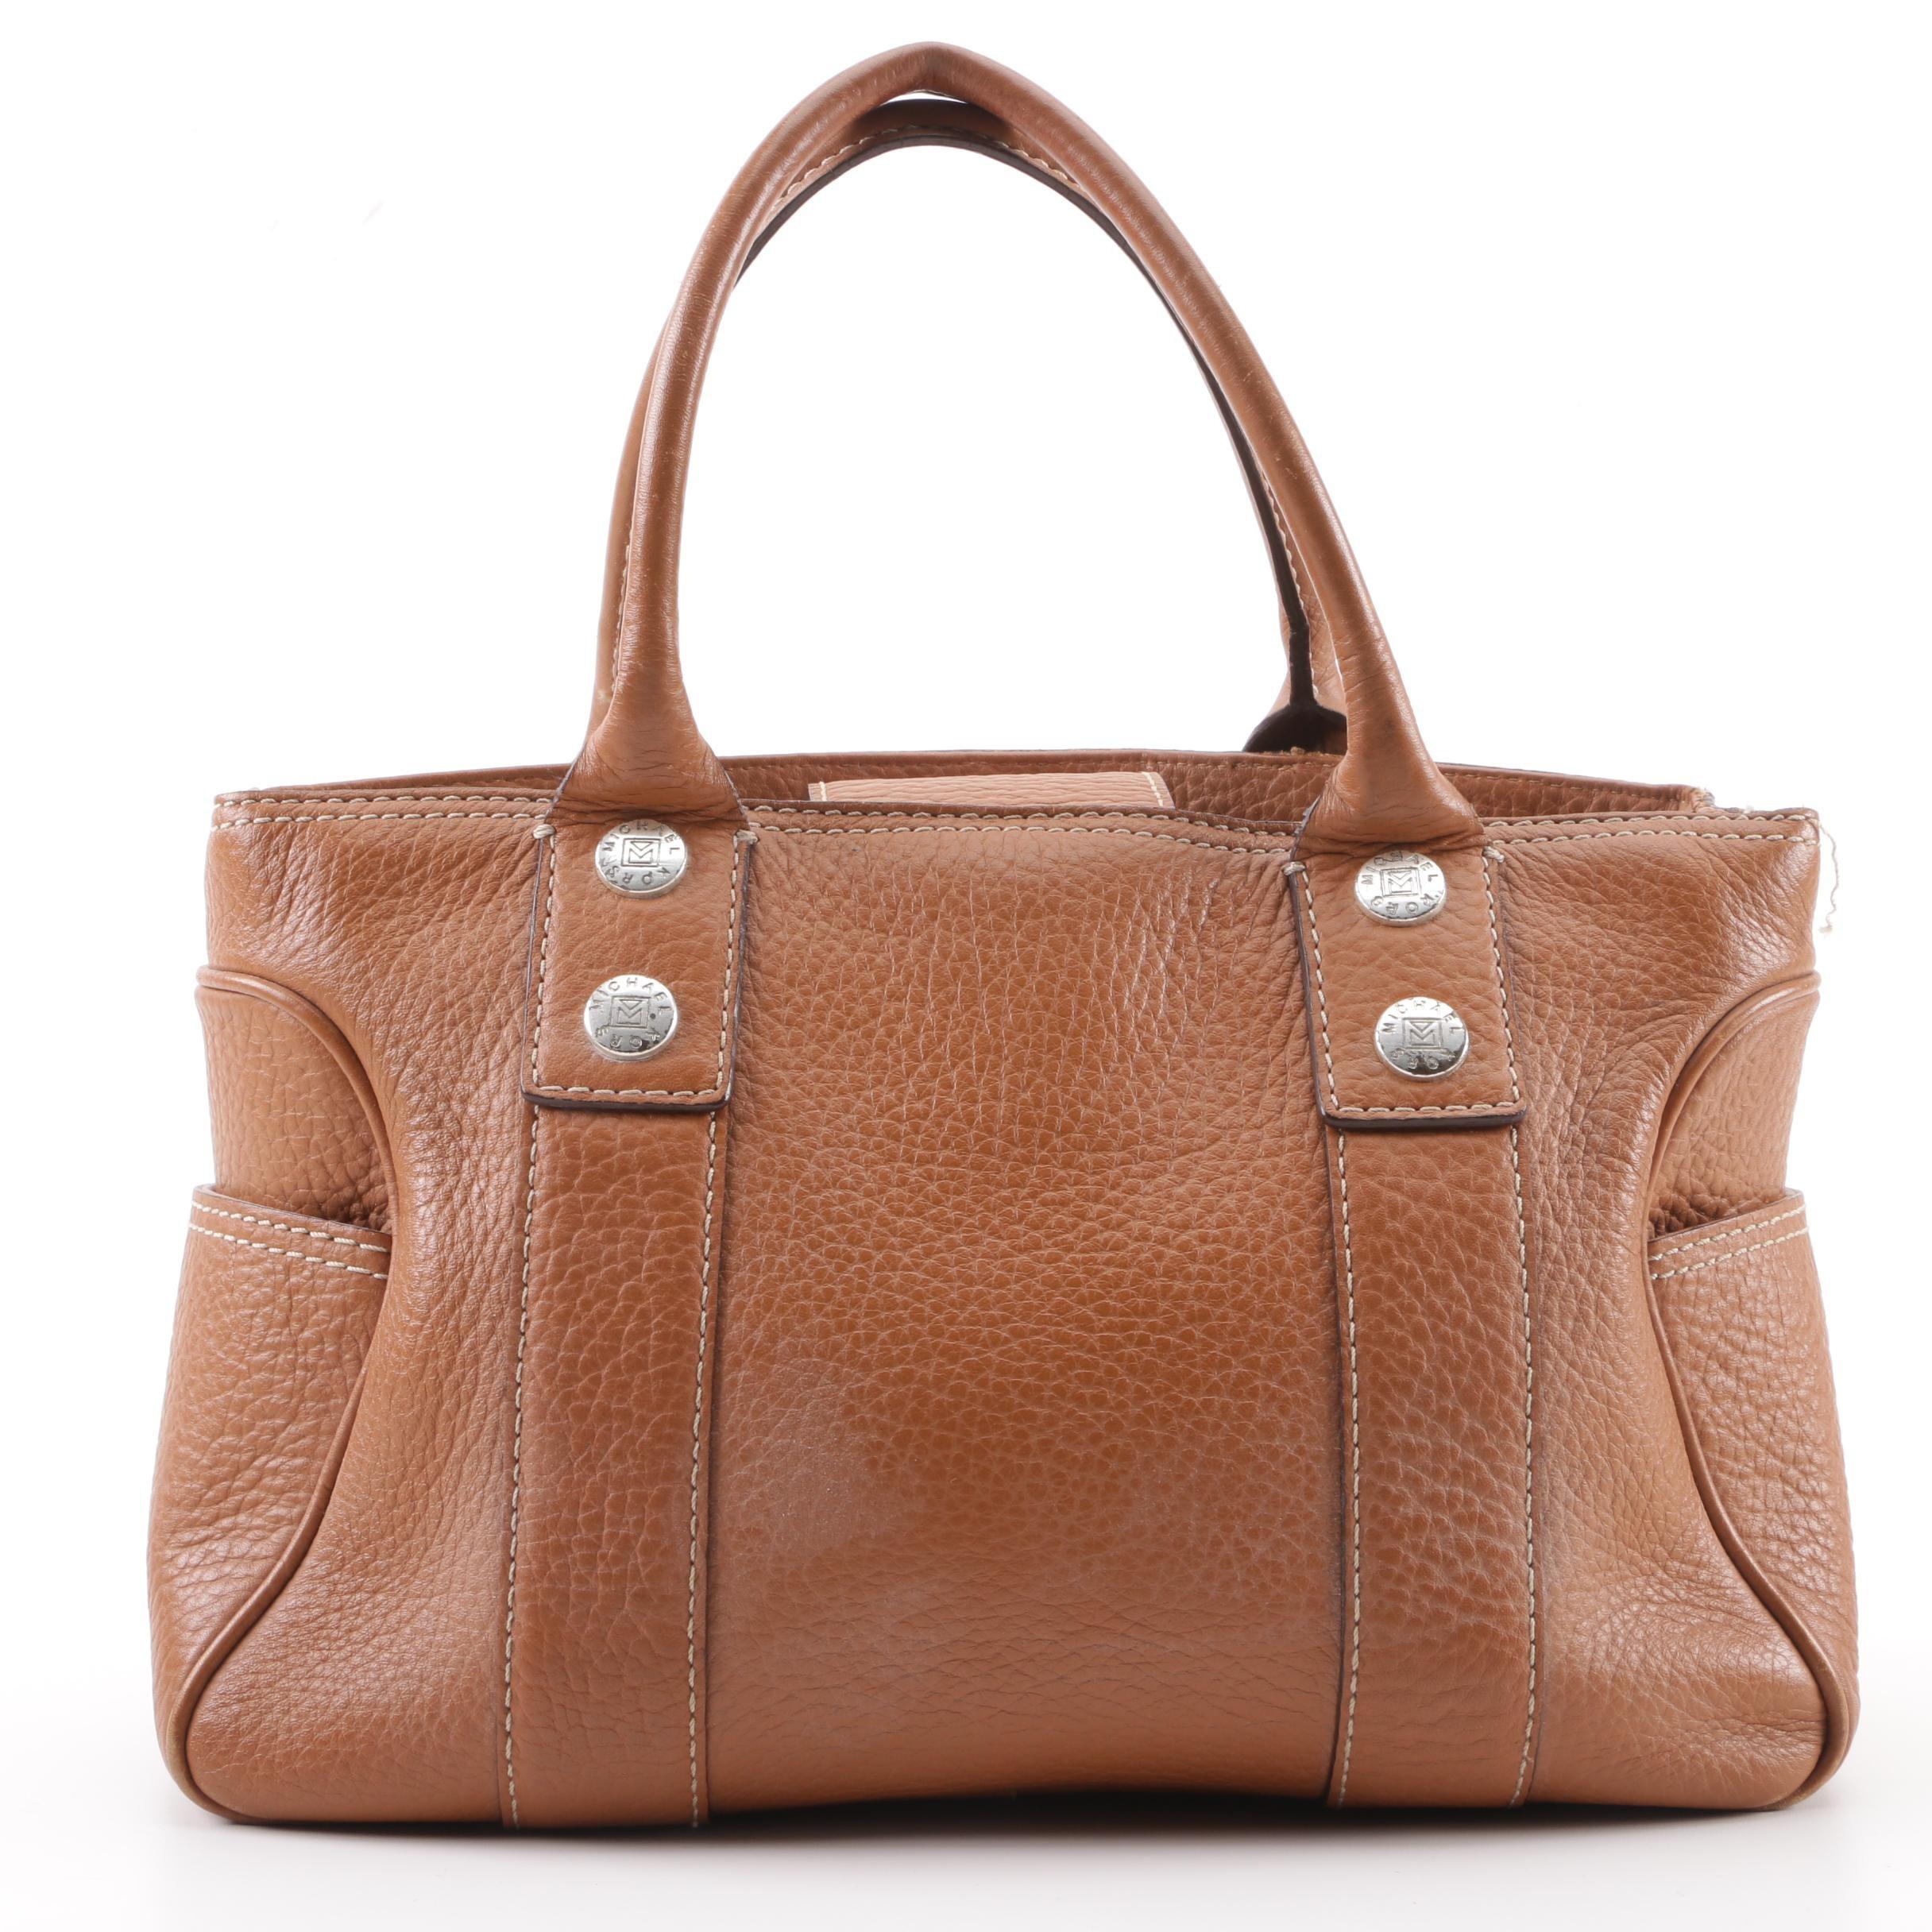 MICHAEL Michael Kors Brown Pebbled Leather Handbag